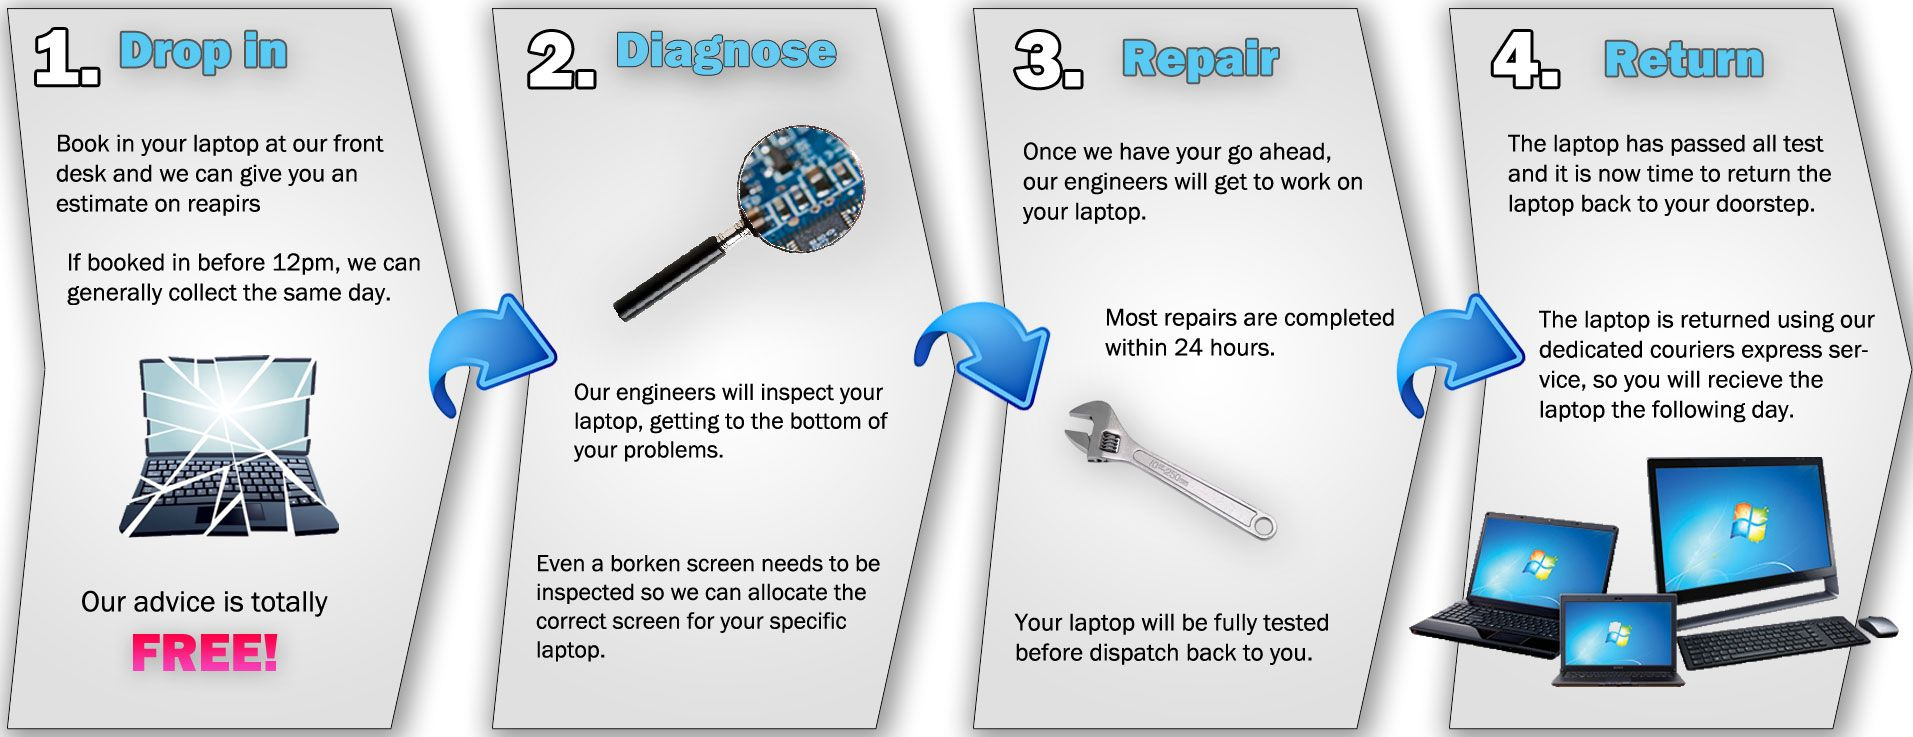 Macbook Laptop Repair Banner For Website Designers To Use